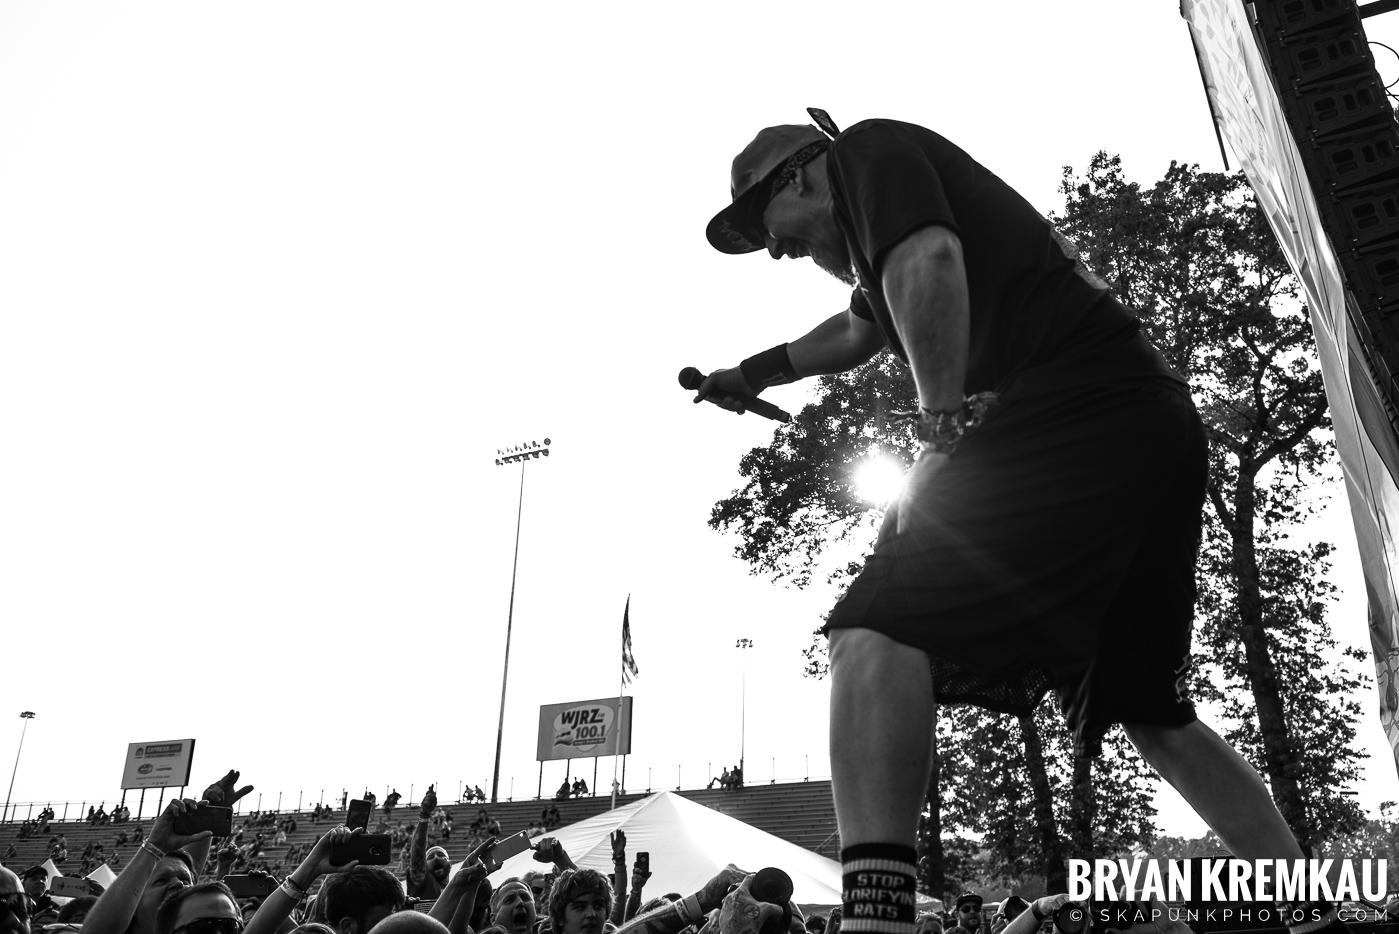 Suicidal Tendencies @ The Bash Music & Craft Beer Festival, Old Bridge Township Raceway Park, Englishtown, NJ - 6.2.19 (35)